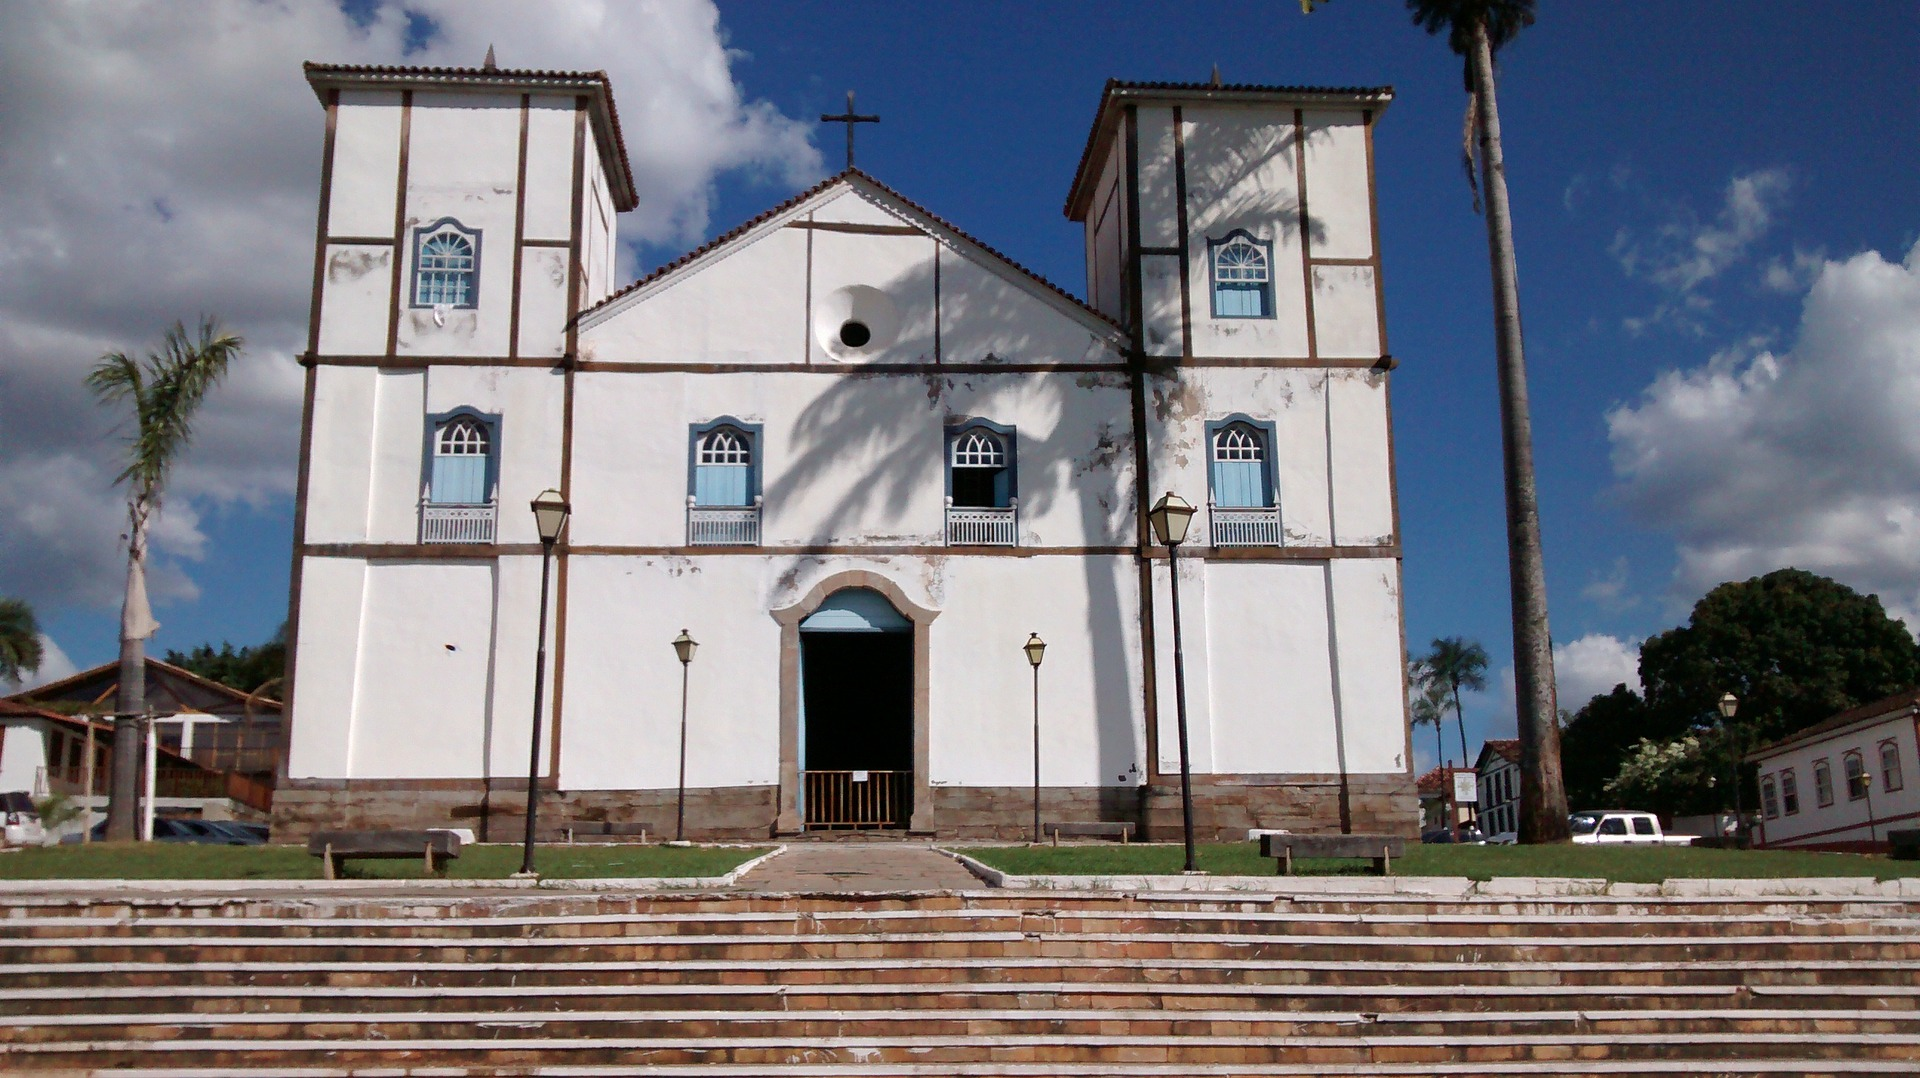 Aragoiânia - Goiás